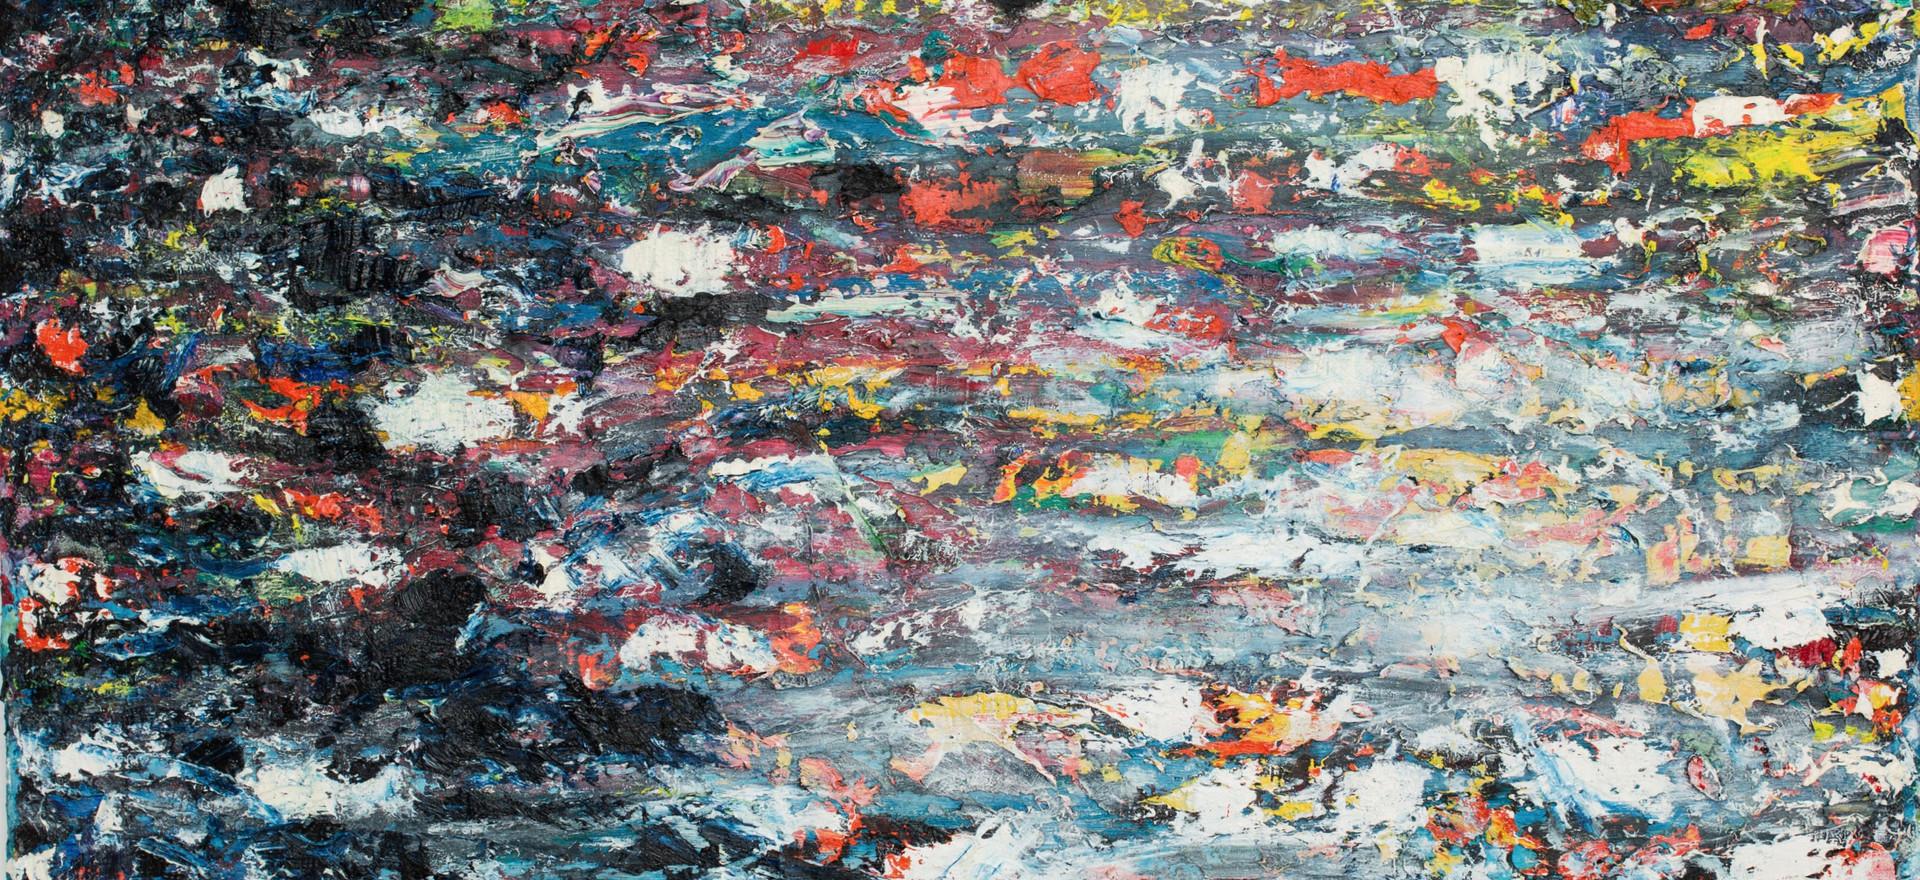 """Paysage"", 2018, 120 x 150 cm.  oil on canvas,"